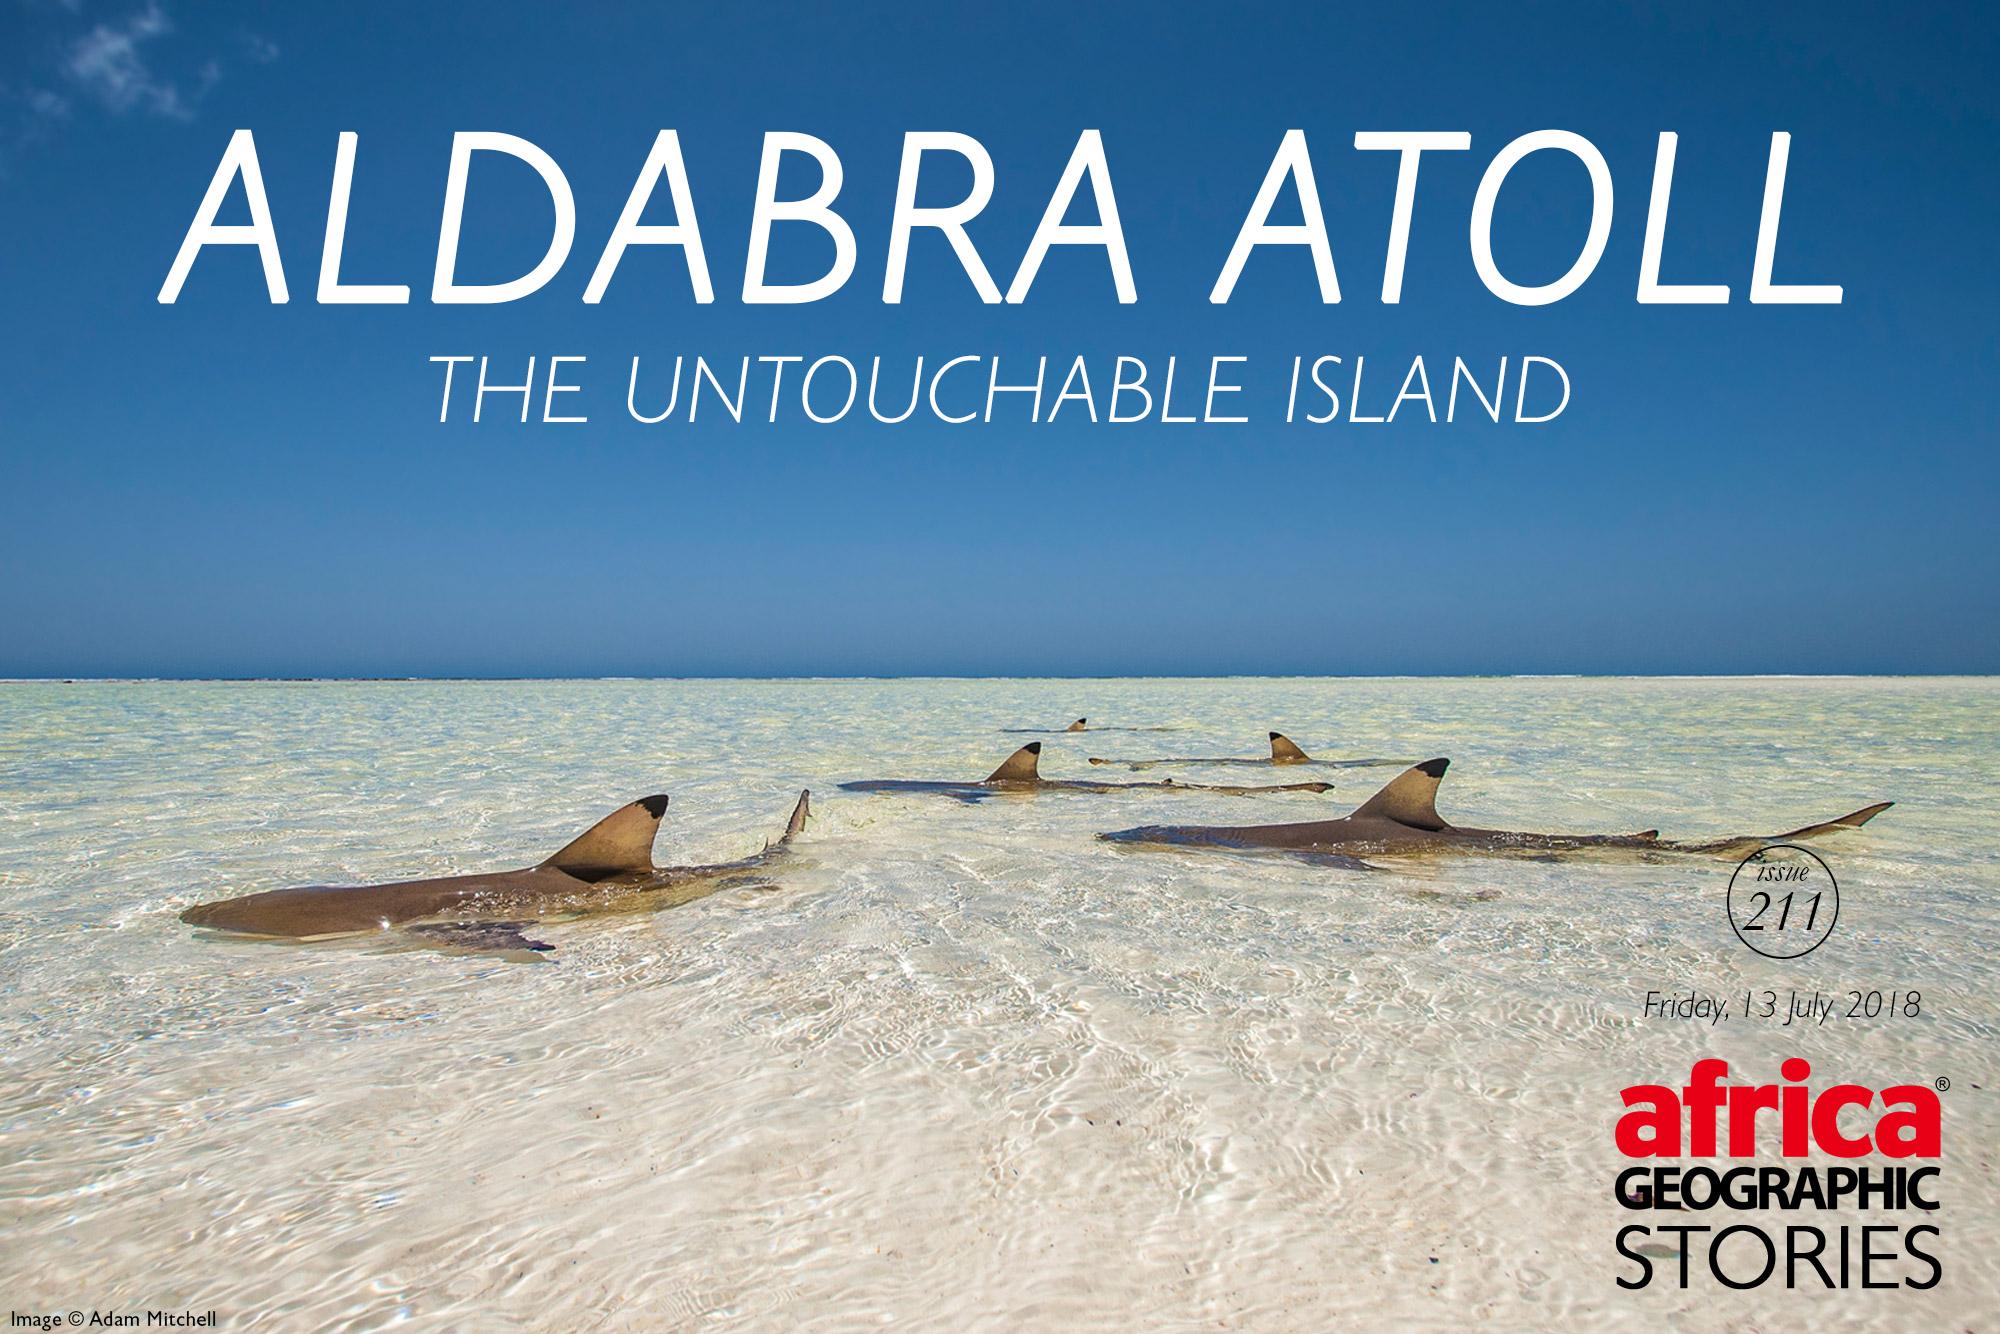 Aldabra Atoll Africa Geographic Magazine